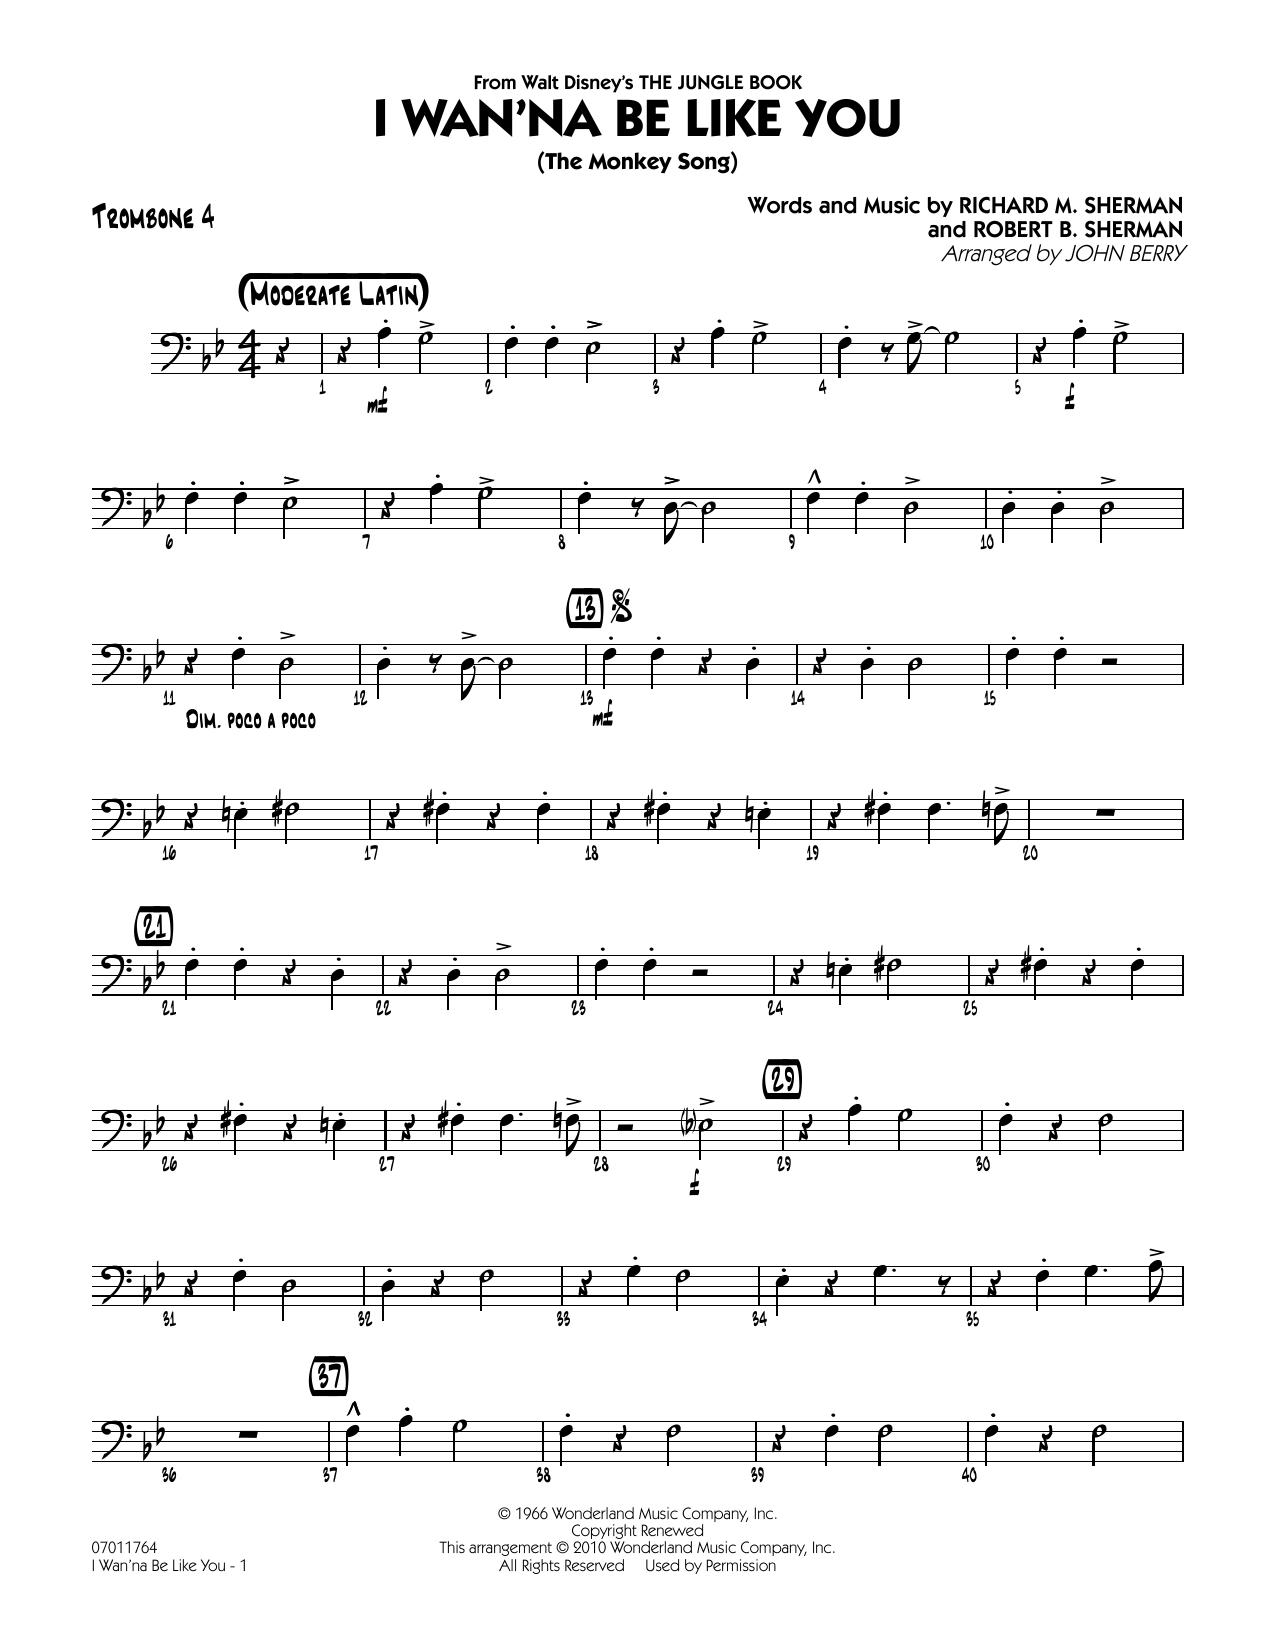 John Berry I Wan Na Be Like You The Monkey Song Trombone 4 Sheet Music Download Pdf Score 293130